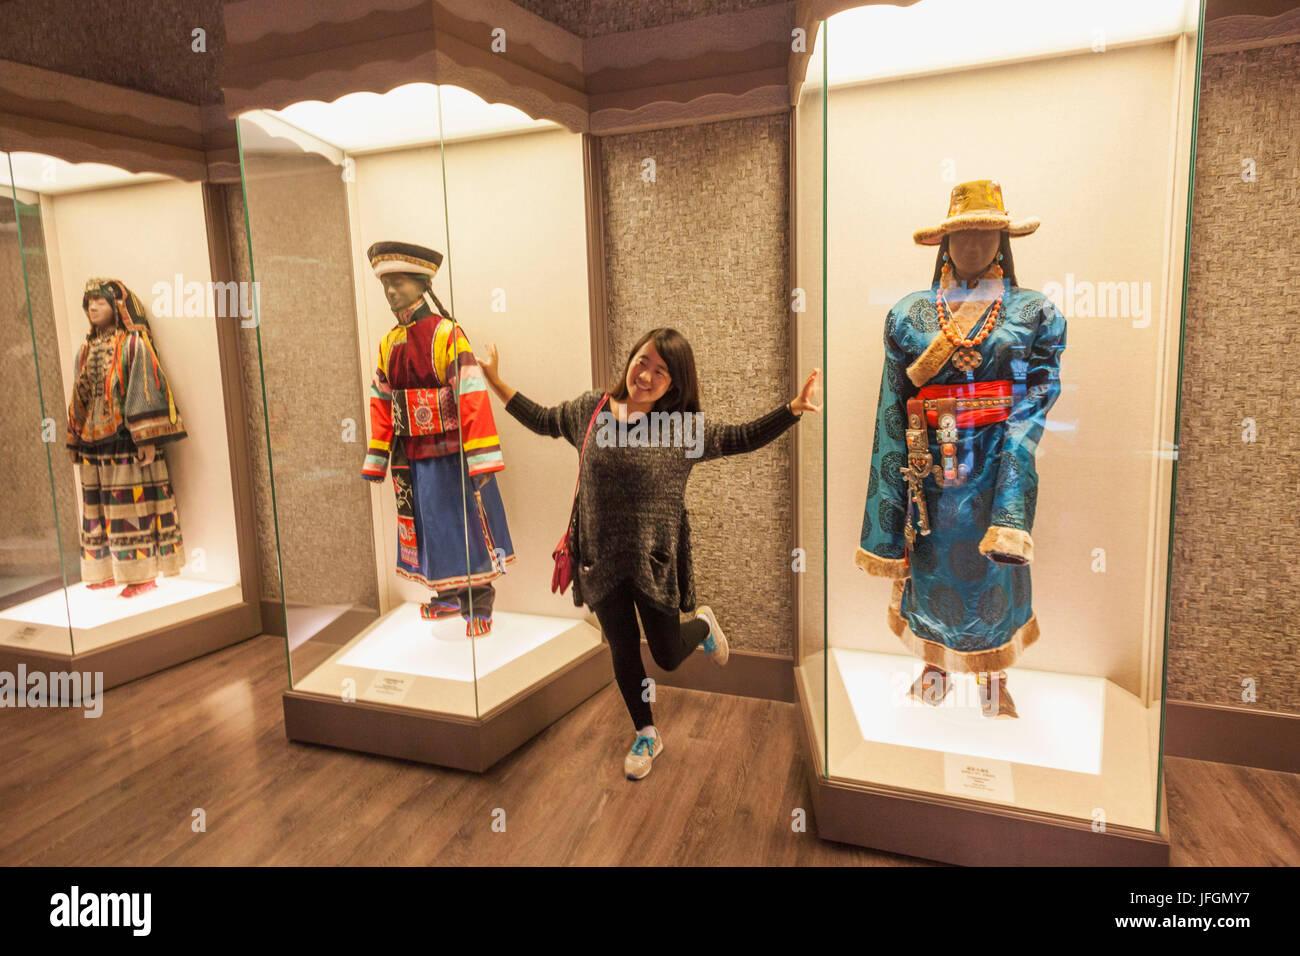 China, Shanghai, el museo de Shanghai, Niña posando con minorías étnicas exhibe ropa Imagen De Stock